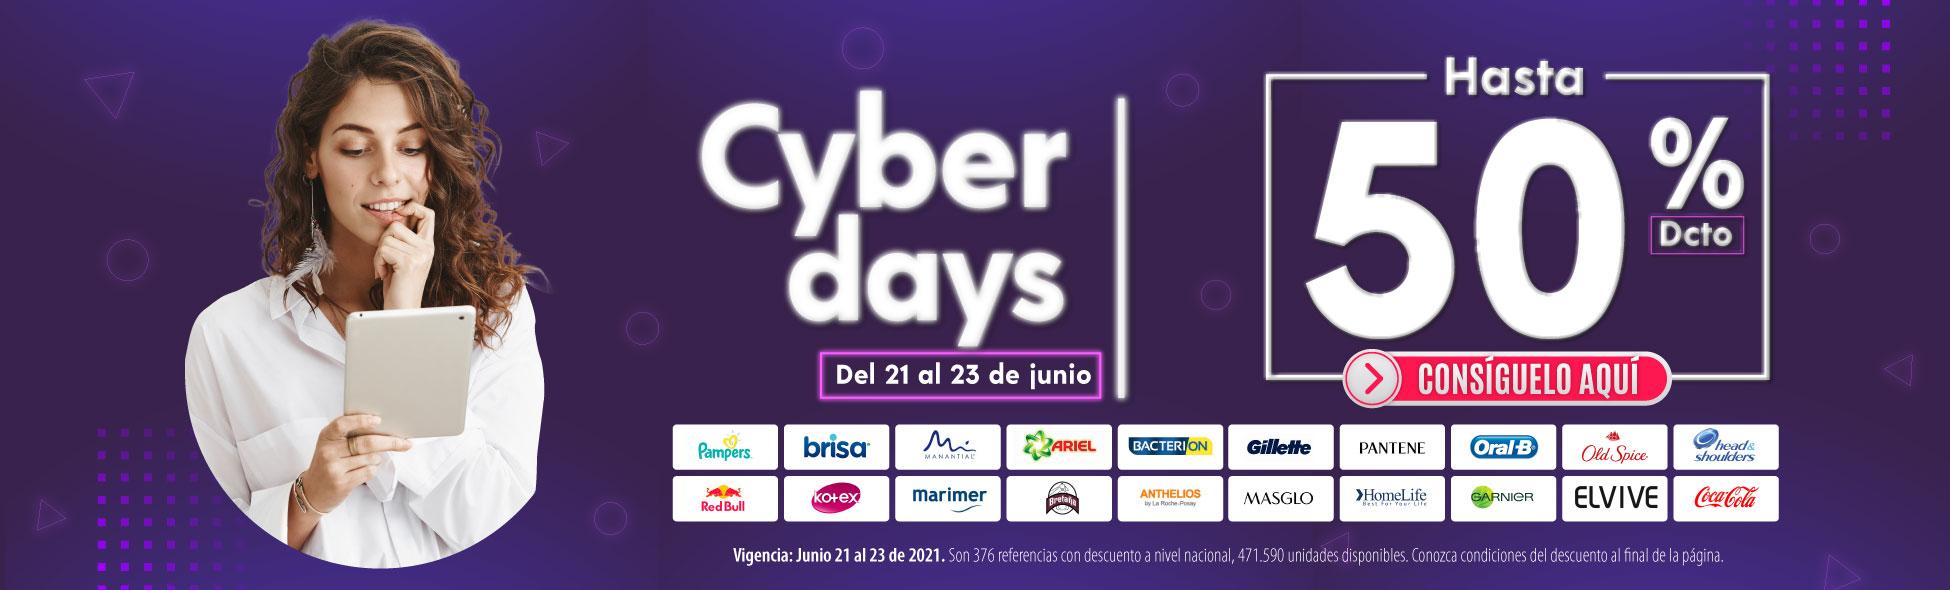 Cyber Days